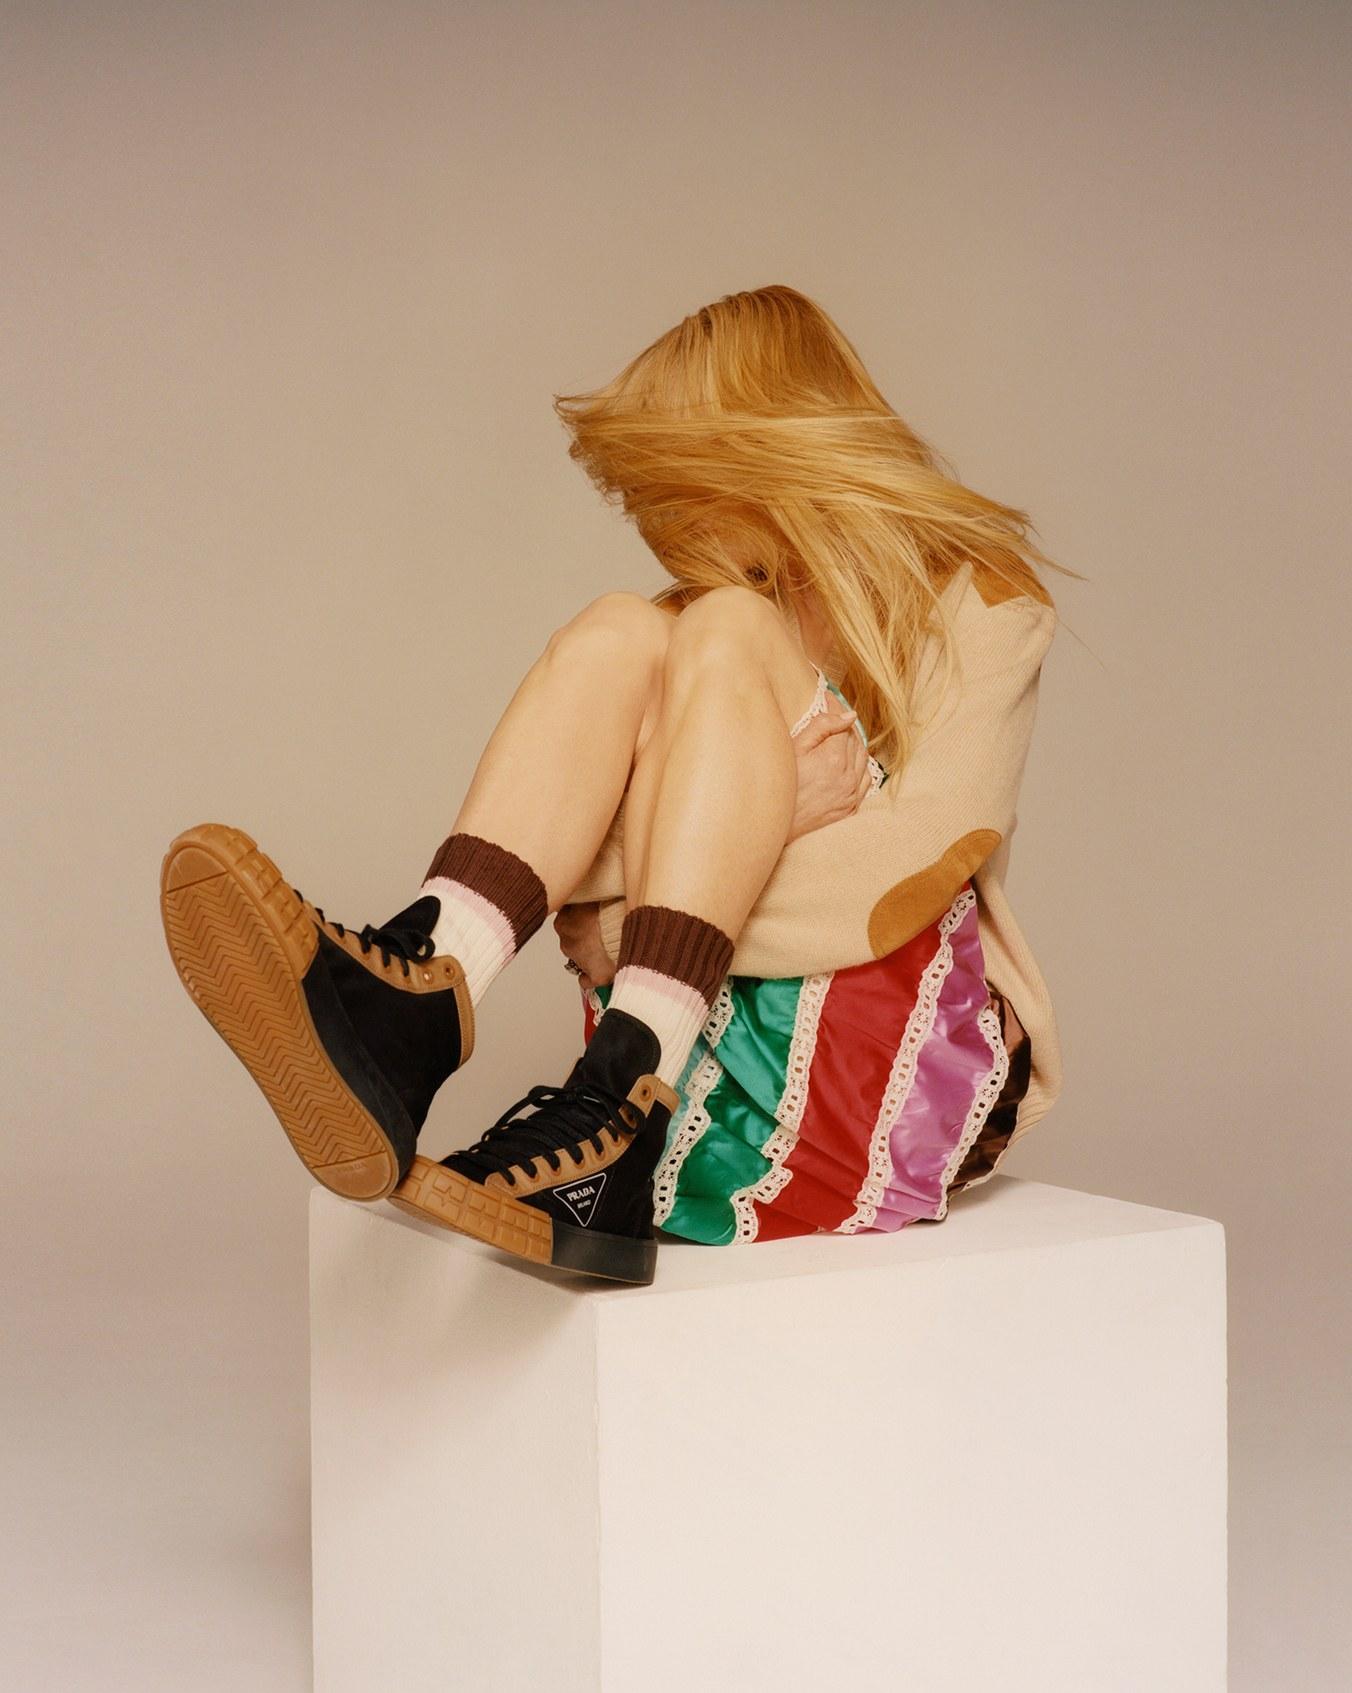 Николь Кидман для фильма Секс-бомба журнал W фото волосы